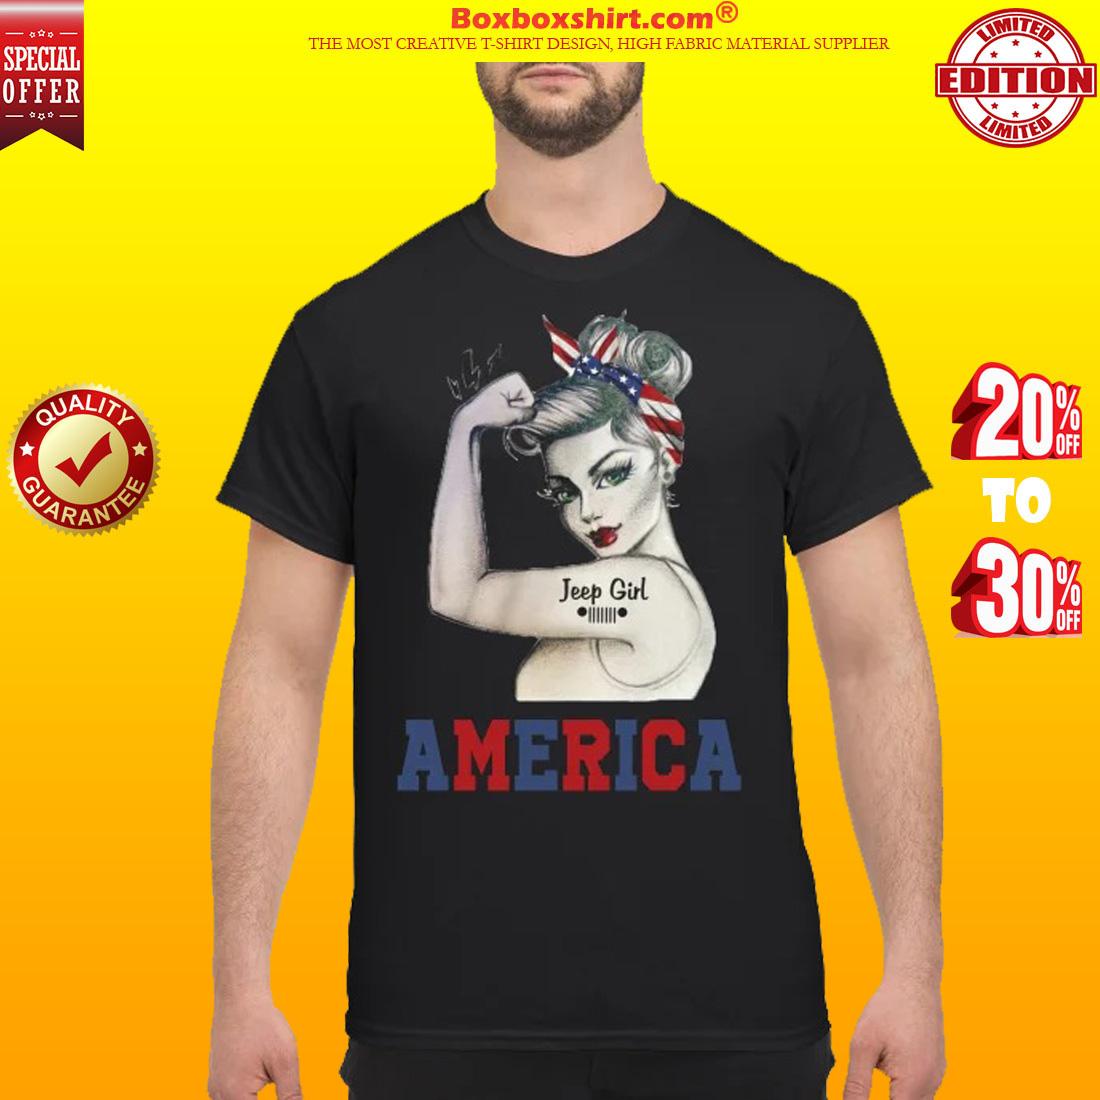 Jeep girl America shirt